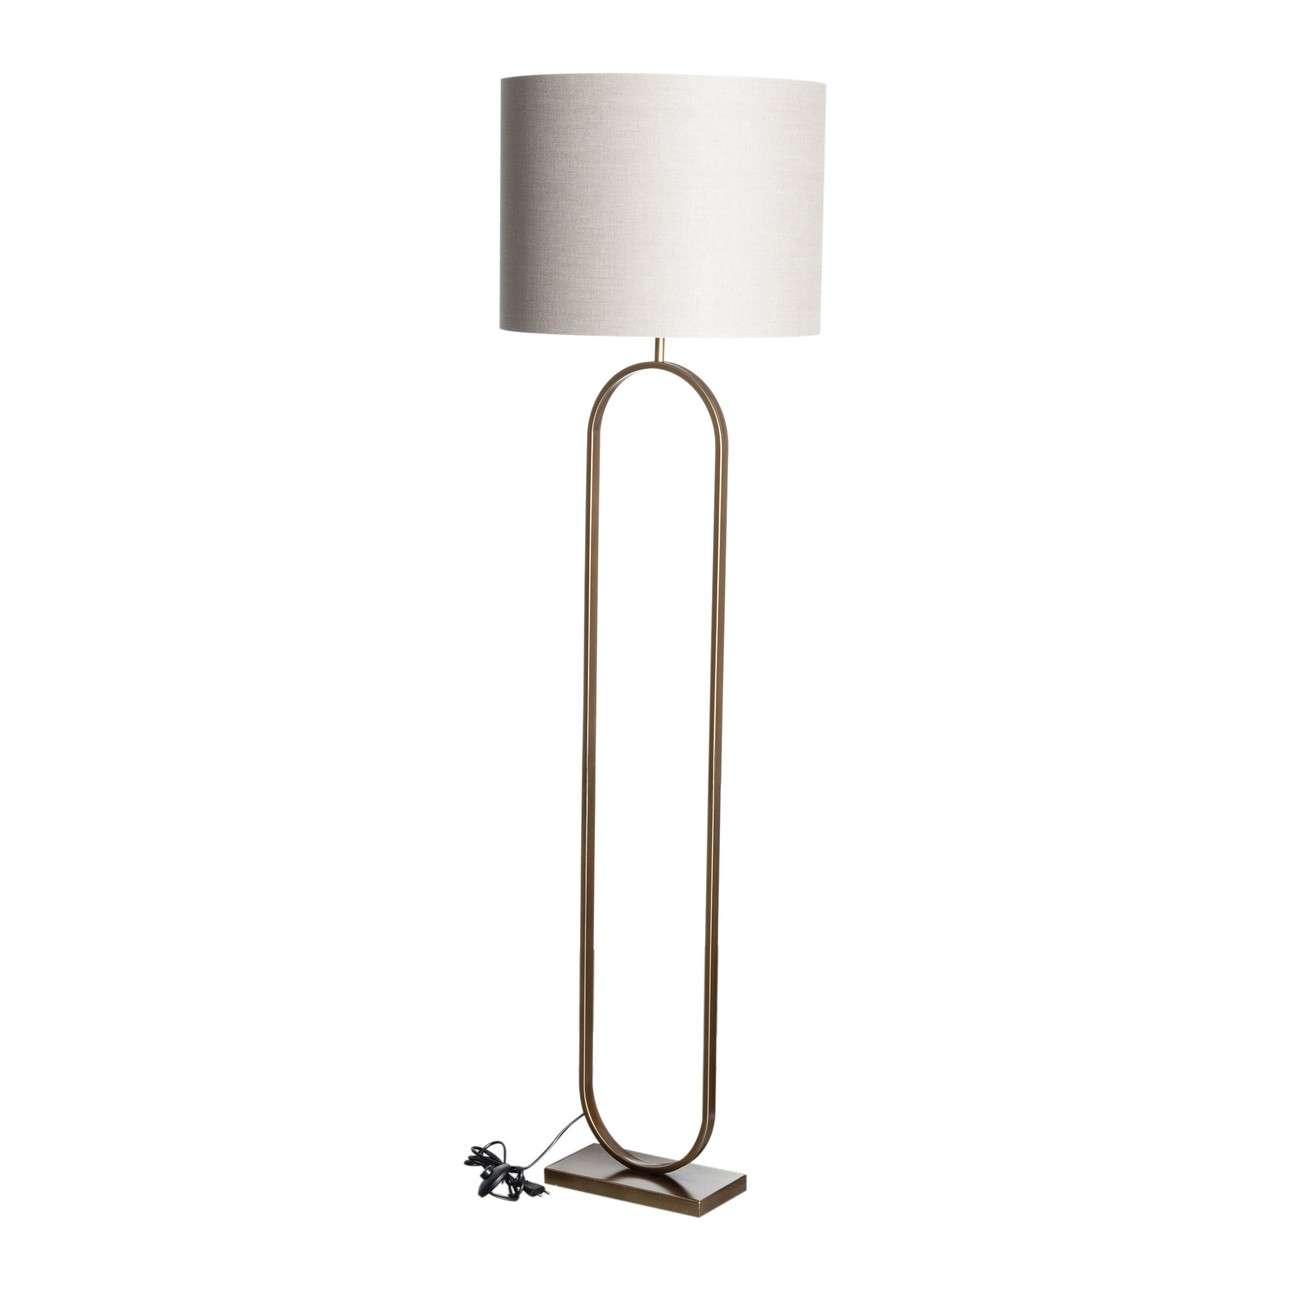 Stojací lampa Mira Light Beige